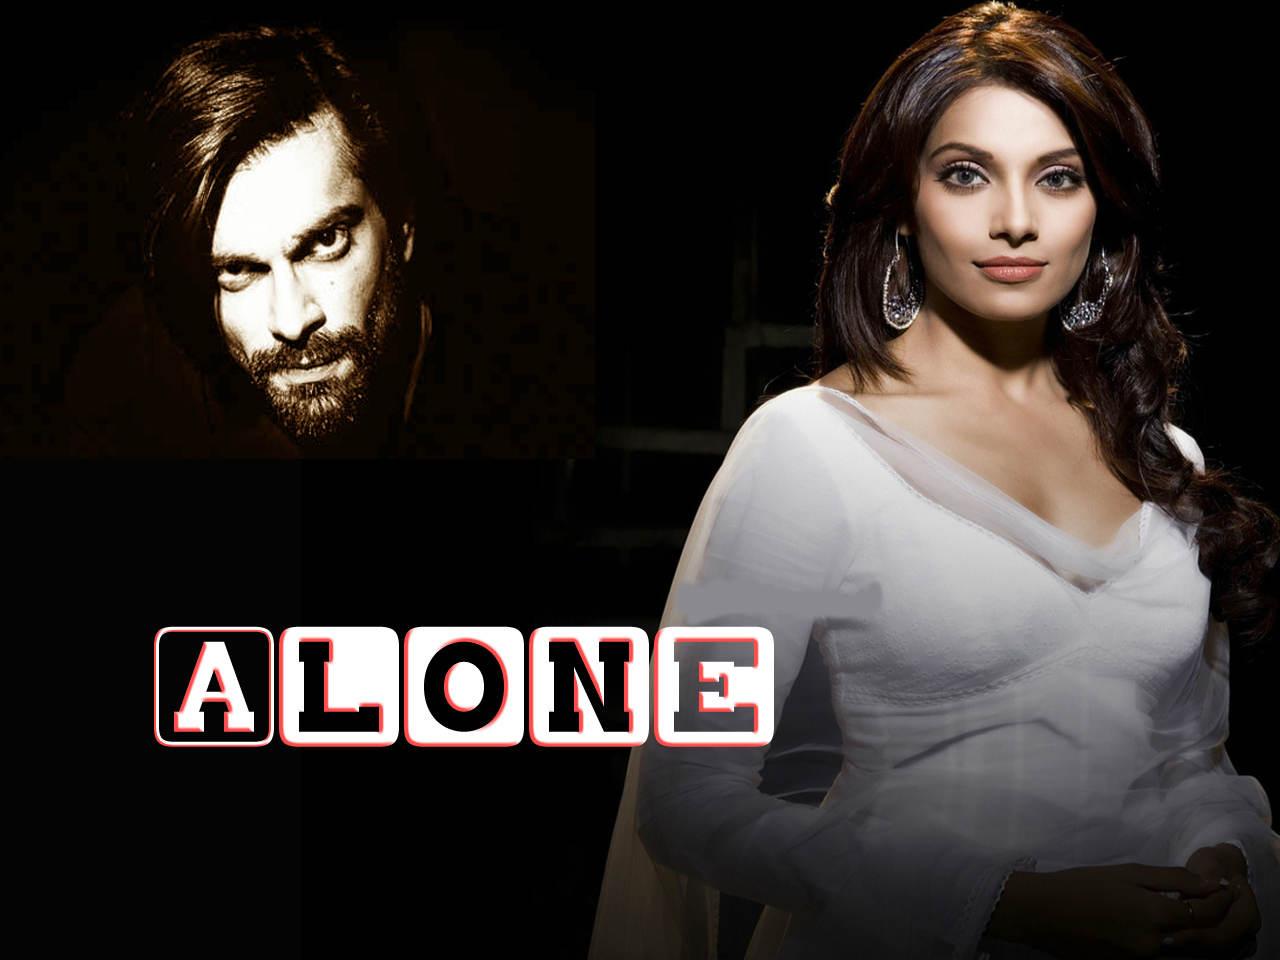 Alone movie that casts Bipasha Basu and Karan Singh